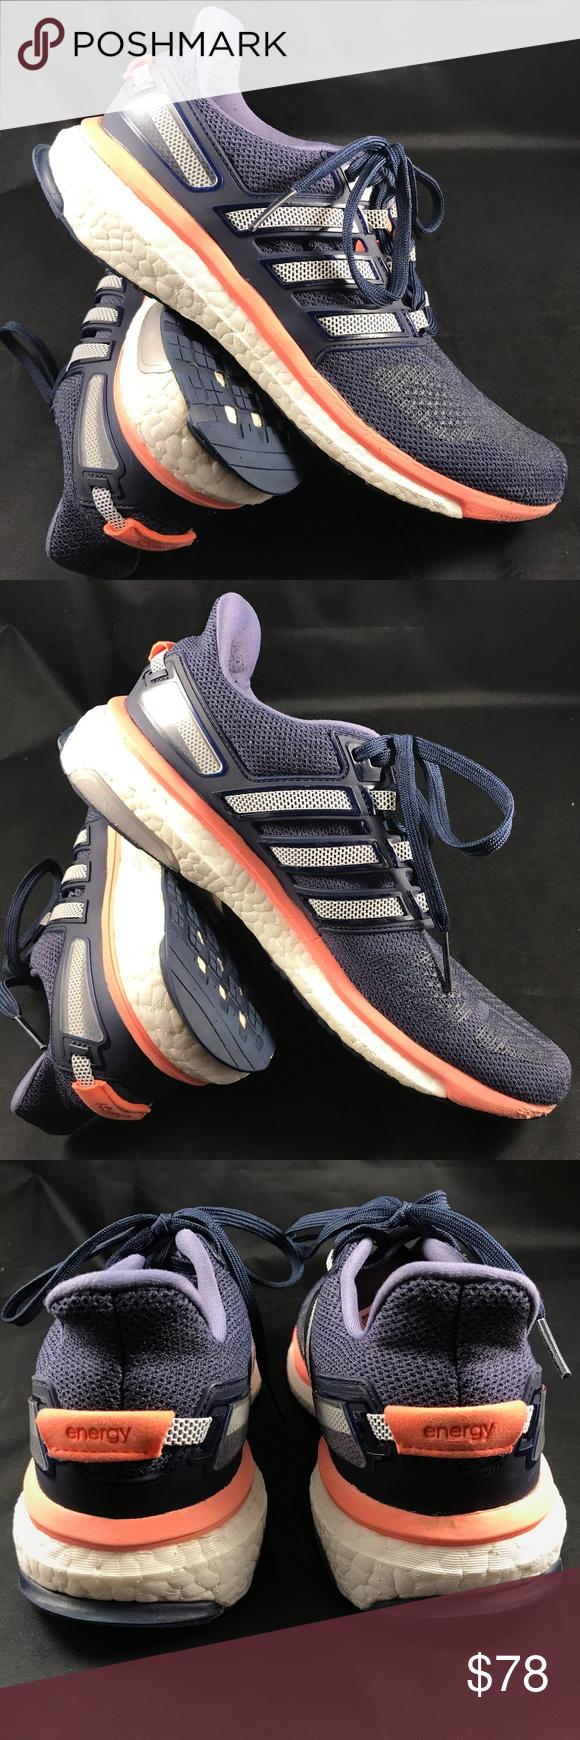 Eccellente adidas energia impulso 3 marina coral 9 wms le scarpe sportive